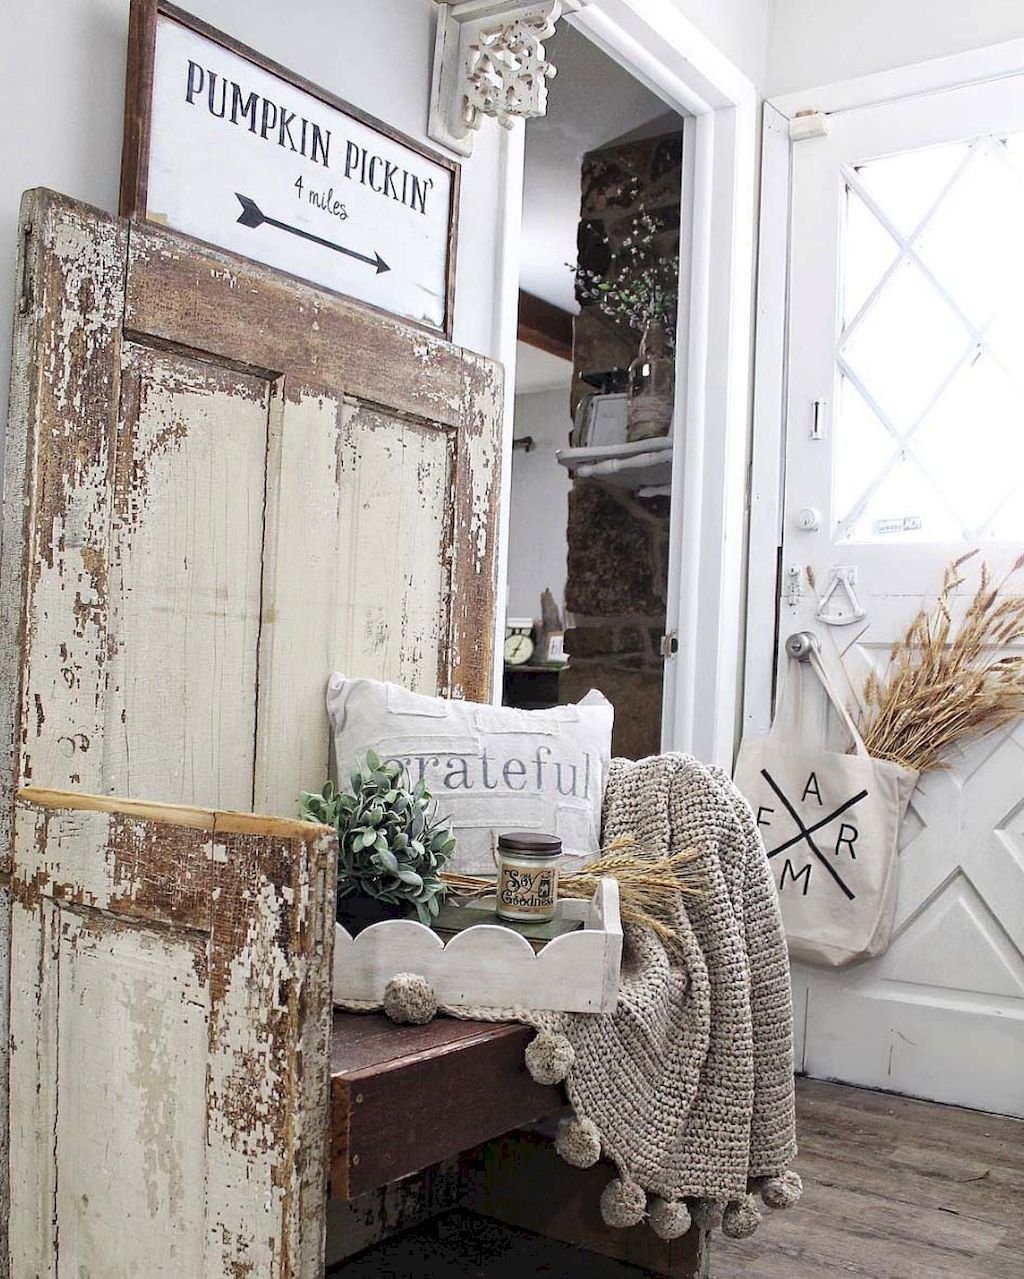 Rustic Home Decorating Ideas: 40 Rustic Farmhouse Entryway Decorating Ideas